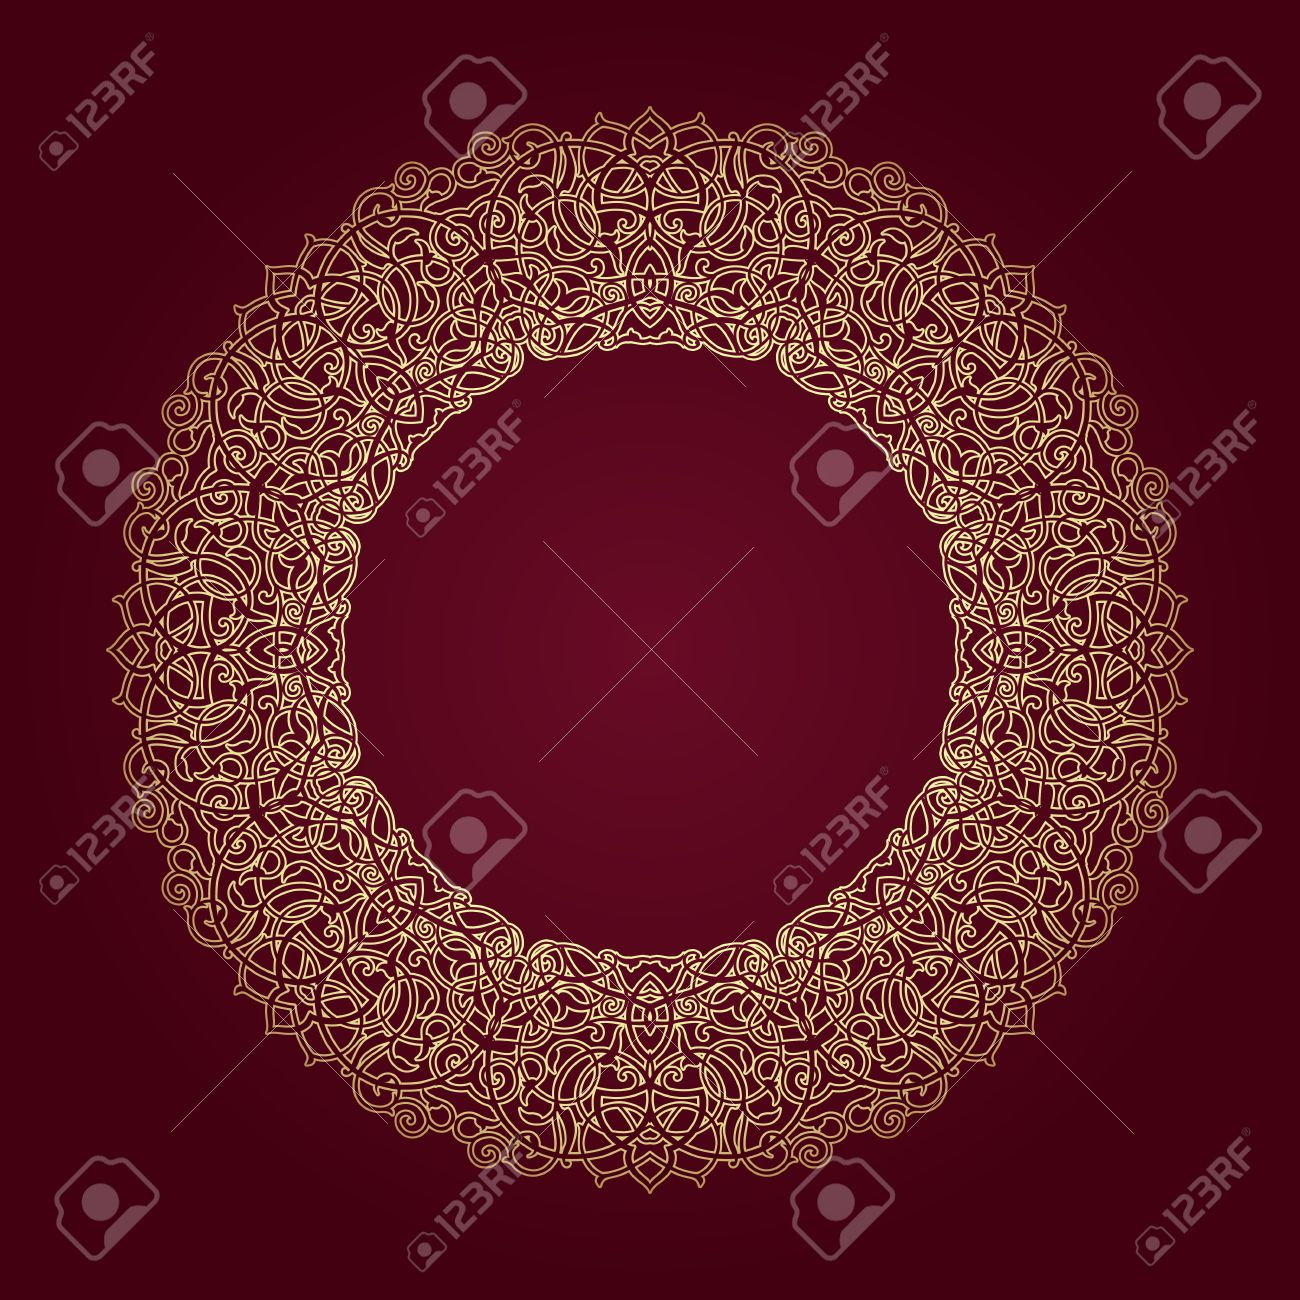 Decorative Ornate Round Frame In Victorian Style. Ornamental ...